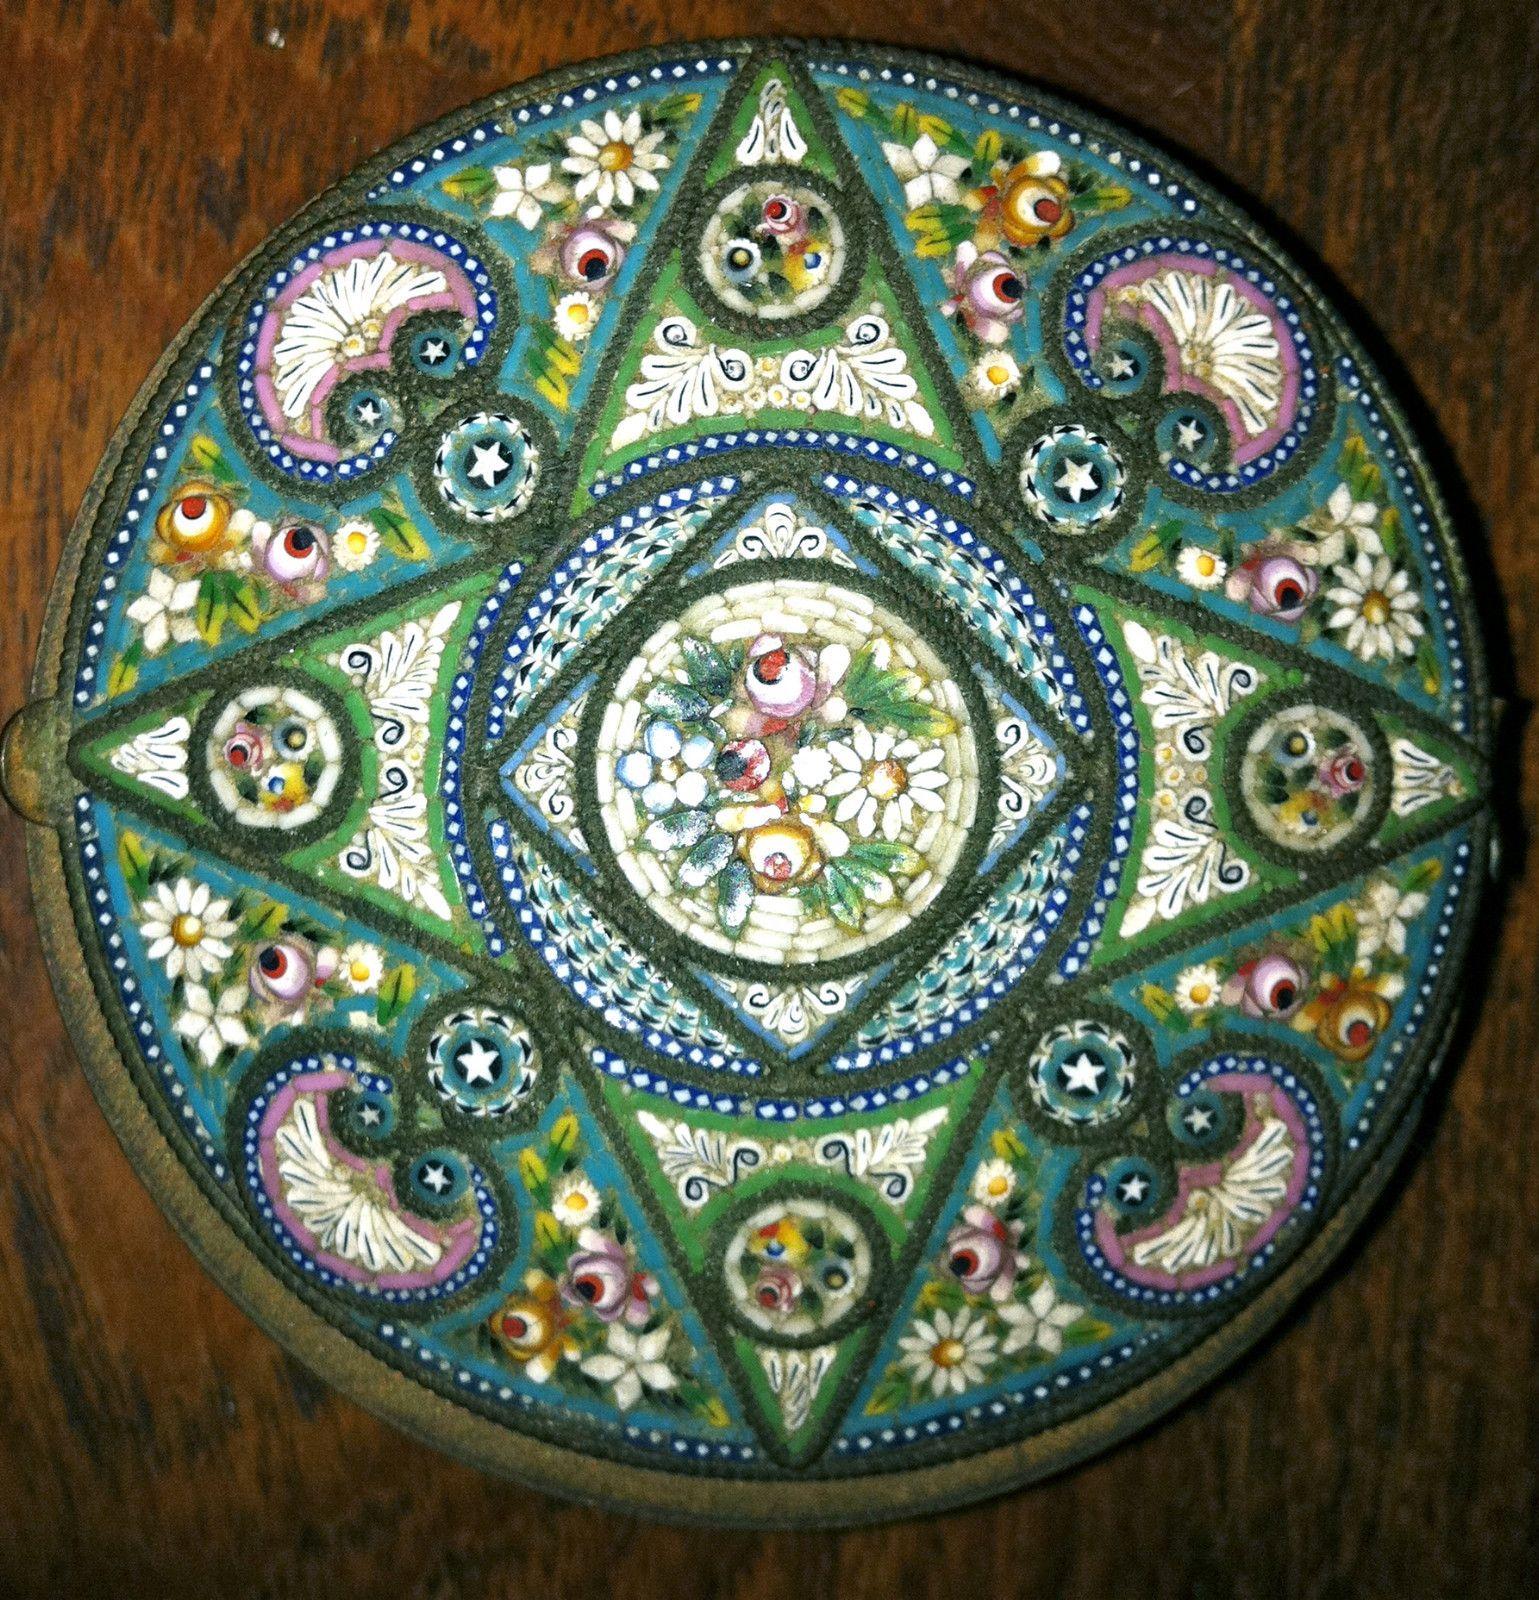 Small Pill Boxes Decorative Antique Italian Micro Mosaic Pill Box  Pill Boxes Mosaics And Box